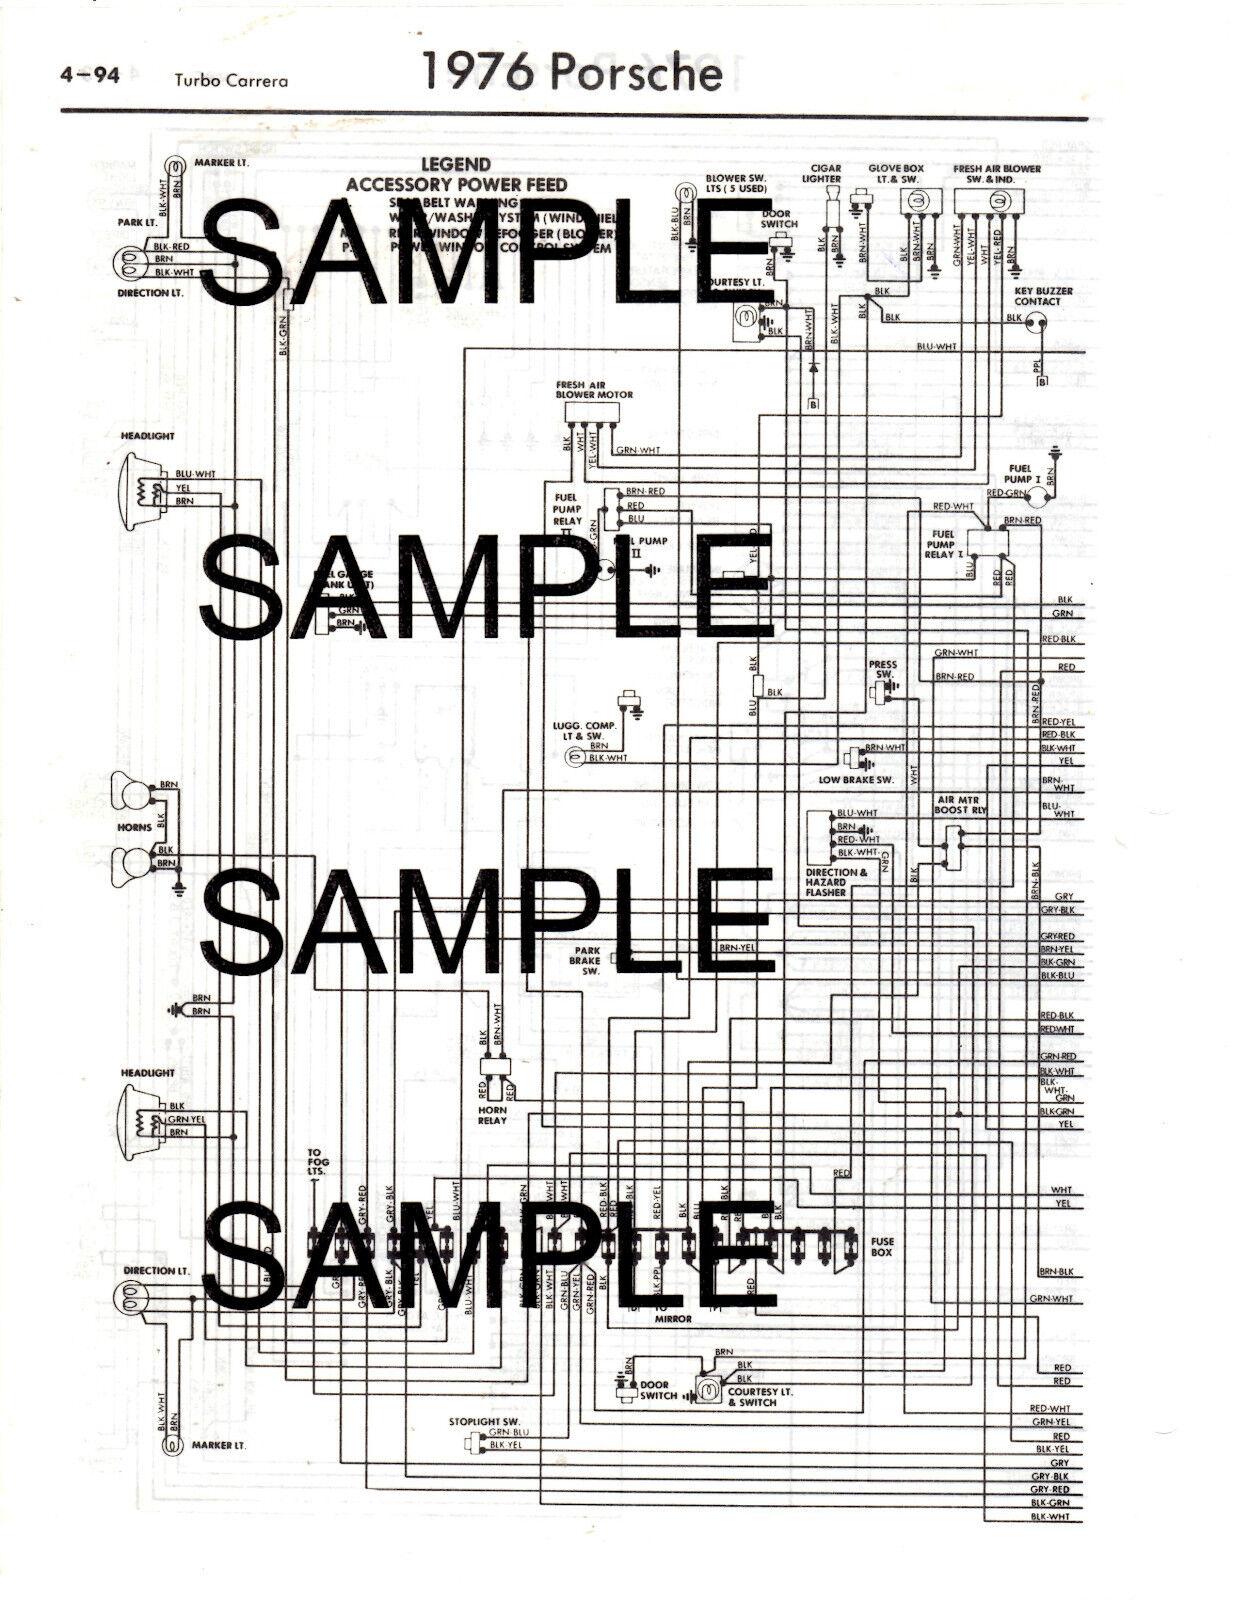 Diagram 1979 928 Porsche Wiring Diagram Full Version Hd Quality Wiring Diagram Blogxgoo Mefpie Fr